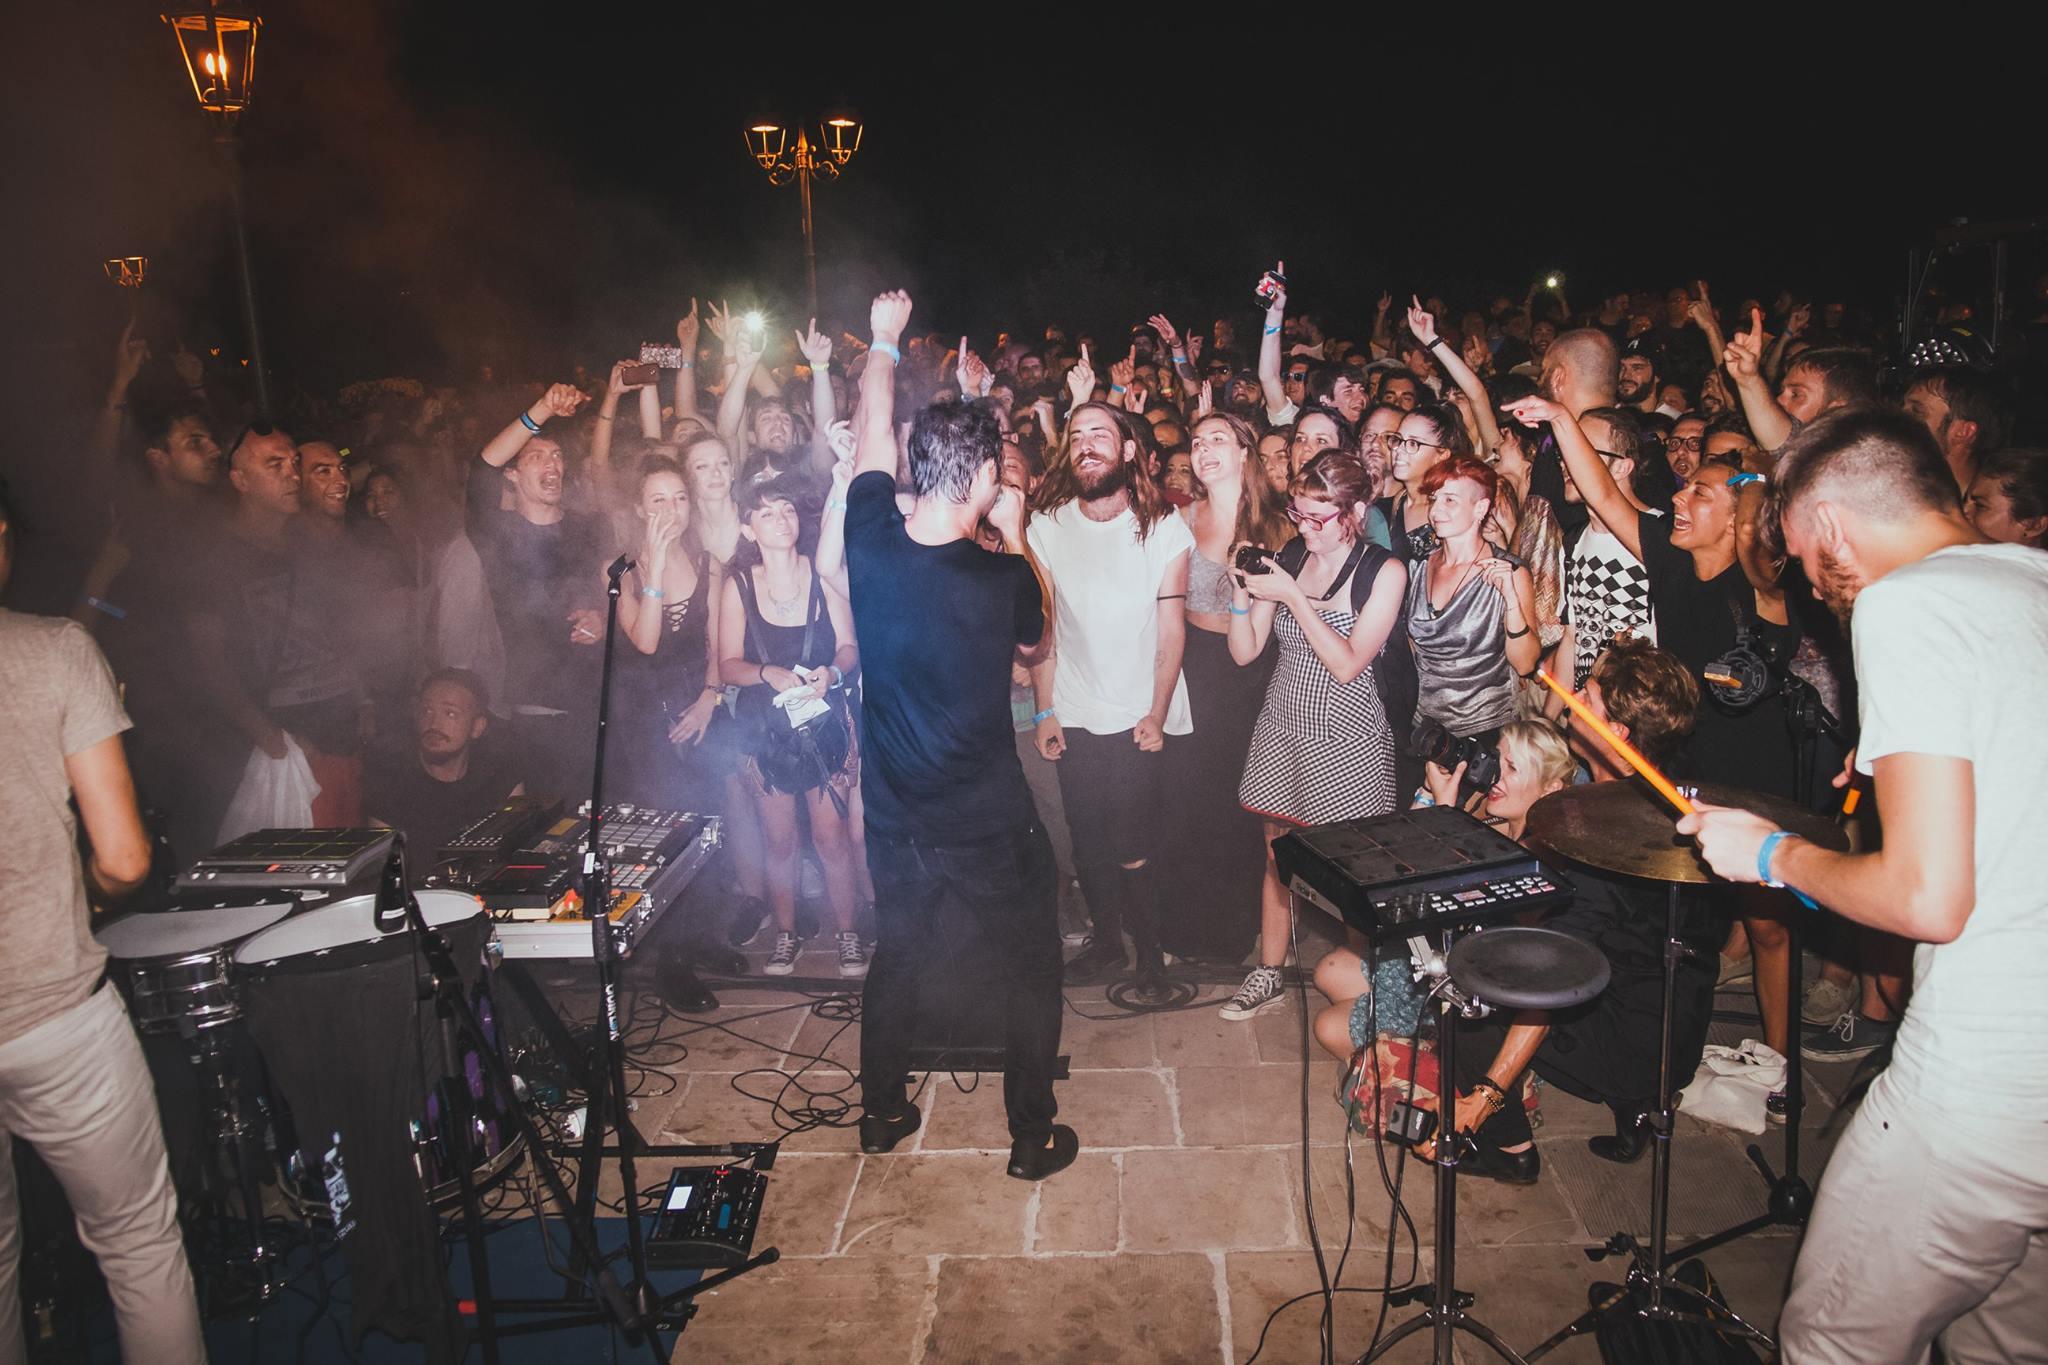 La lineup completa del Siren Festival 2018